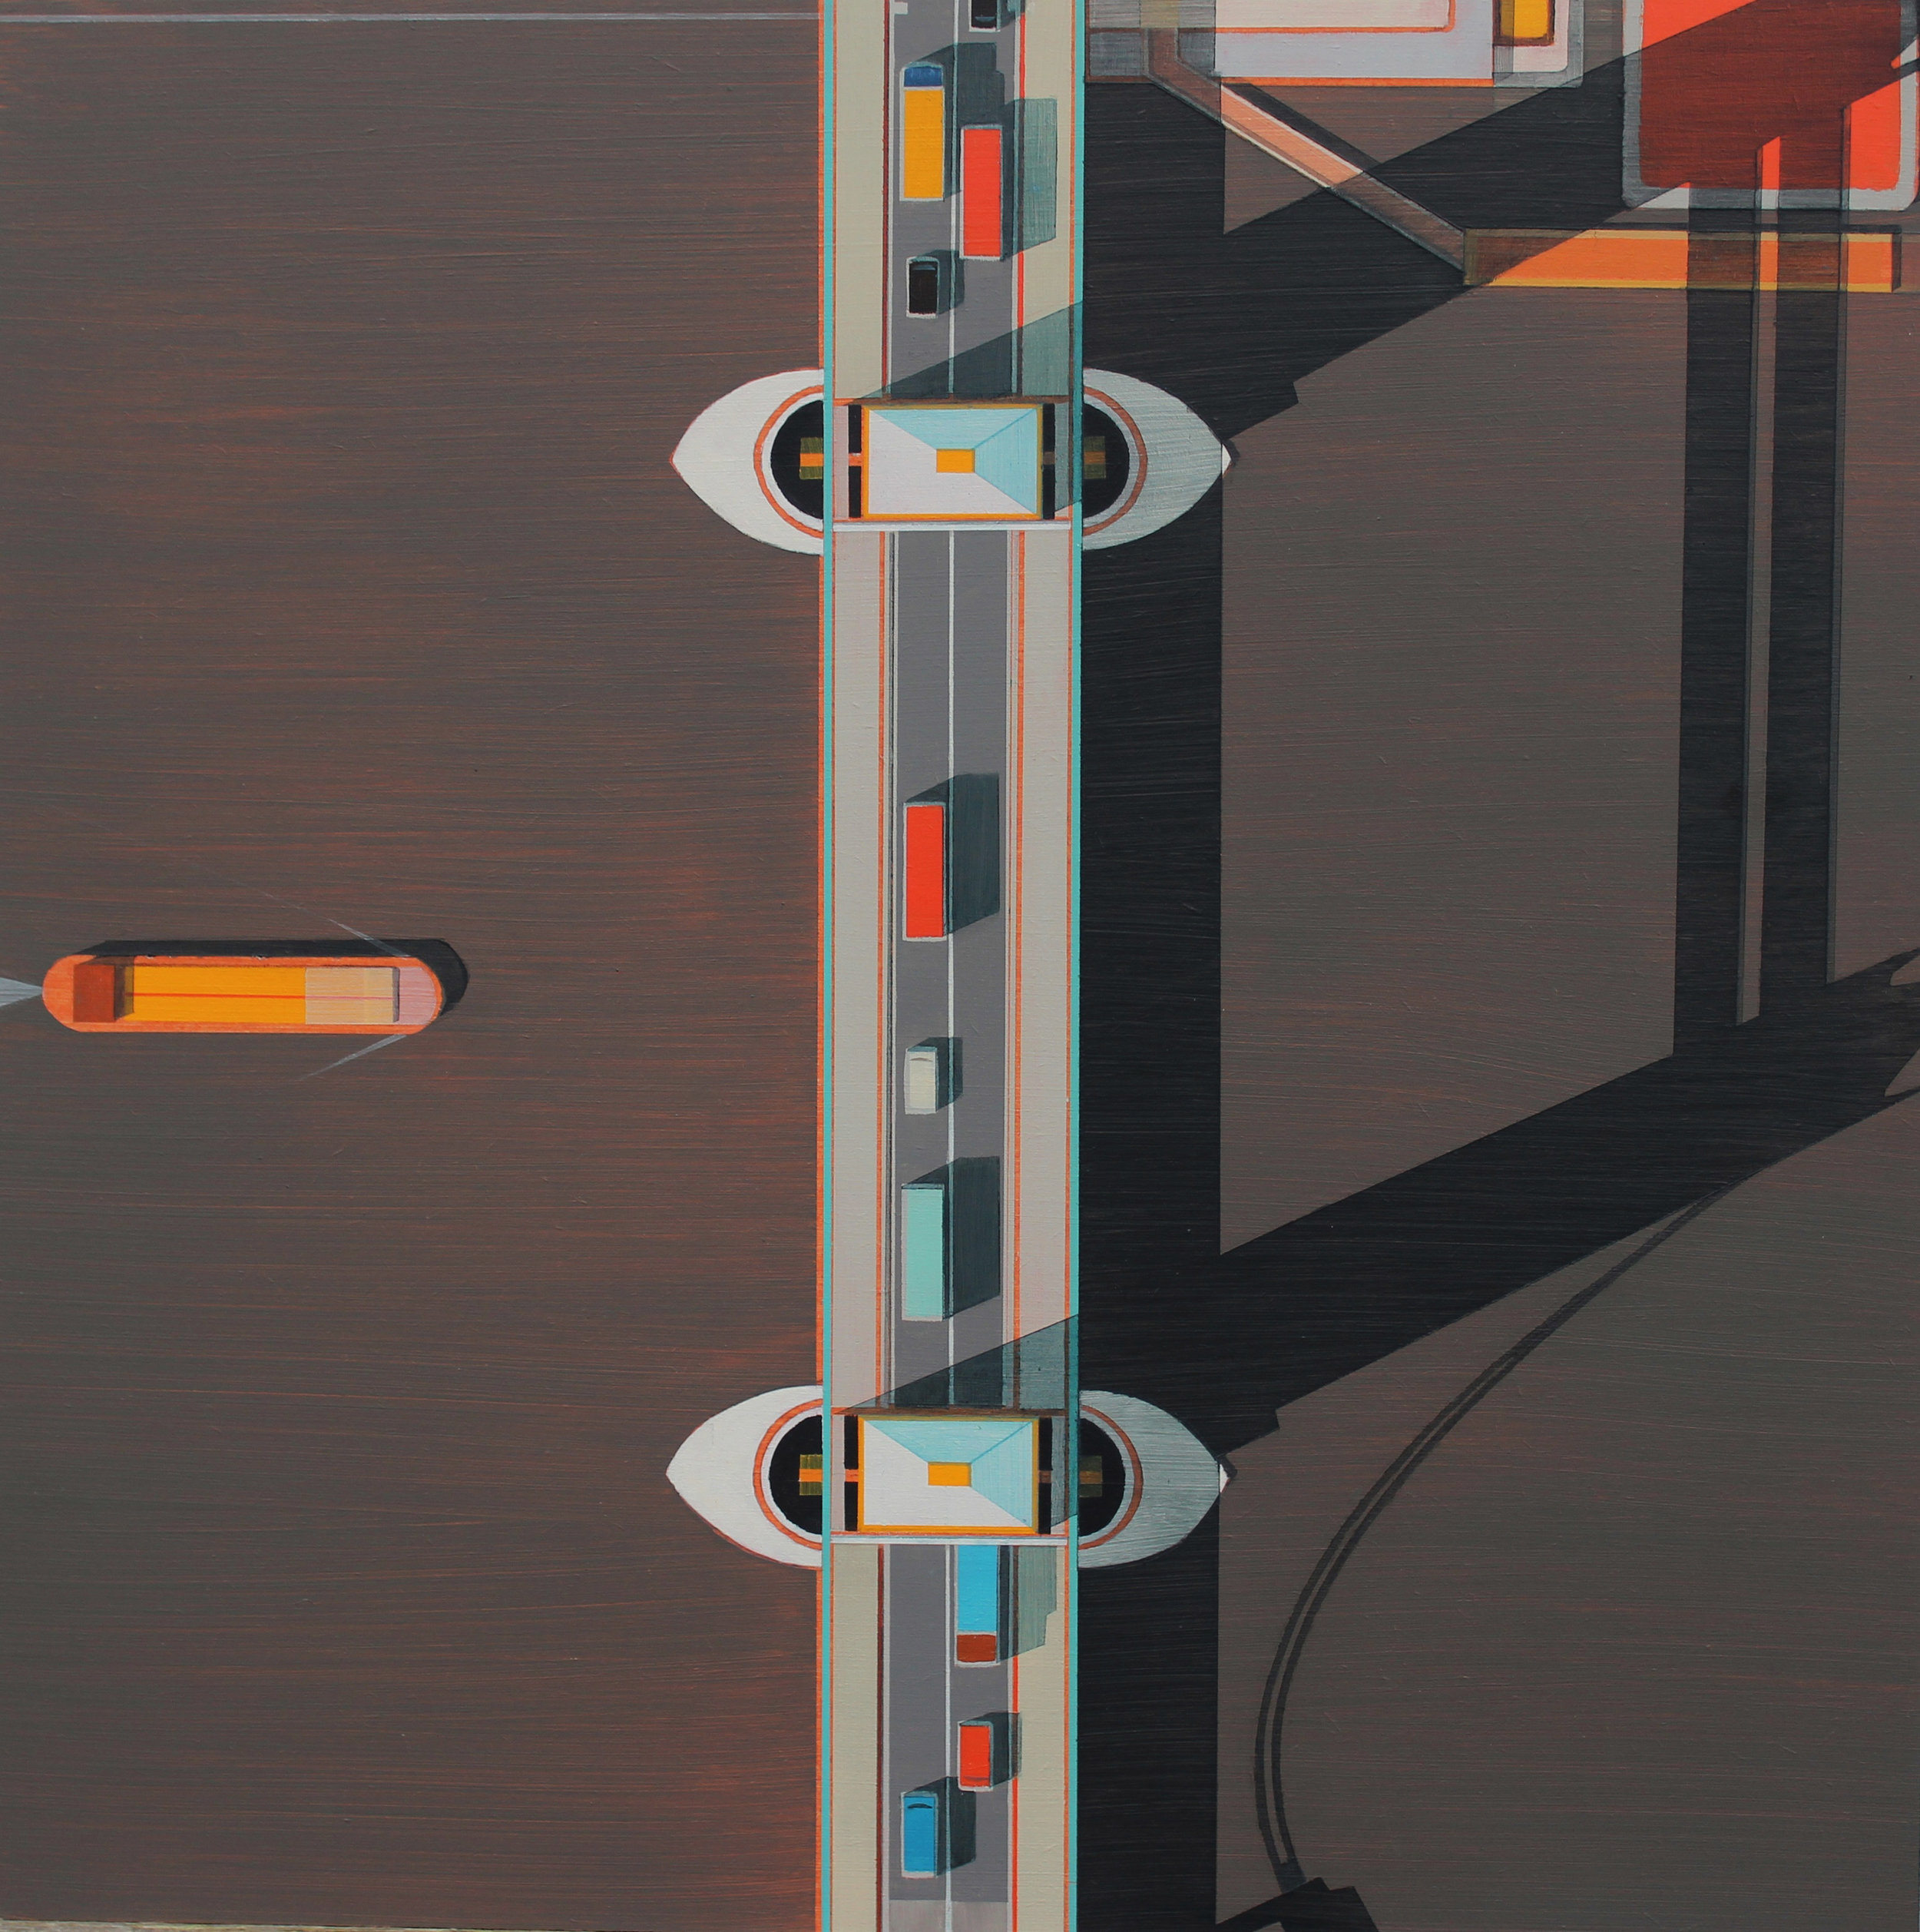 WEB-Tower-Bridge-and-yellow-barge-2017-acrylic-on-board-45x45-cm.jpg